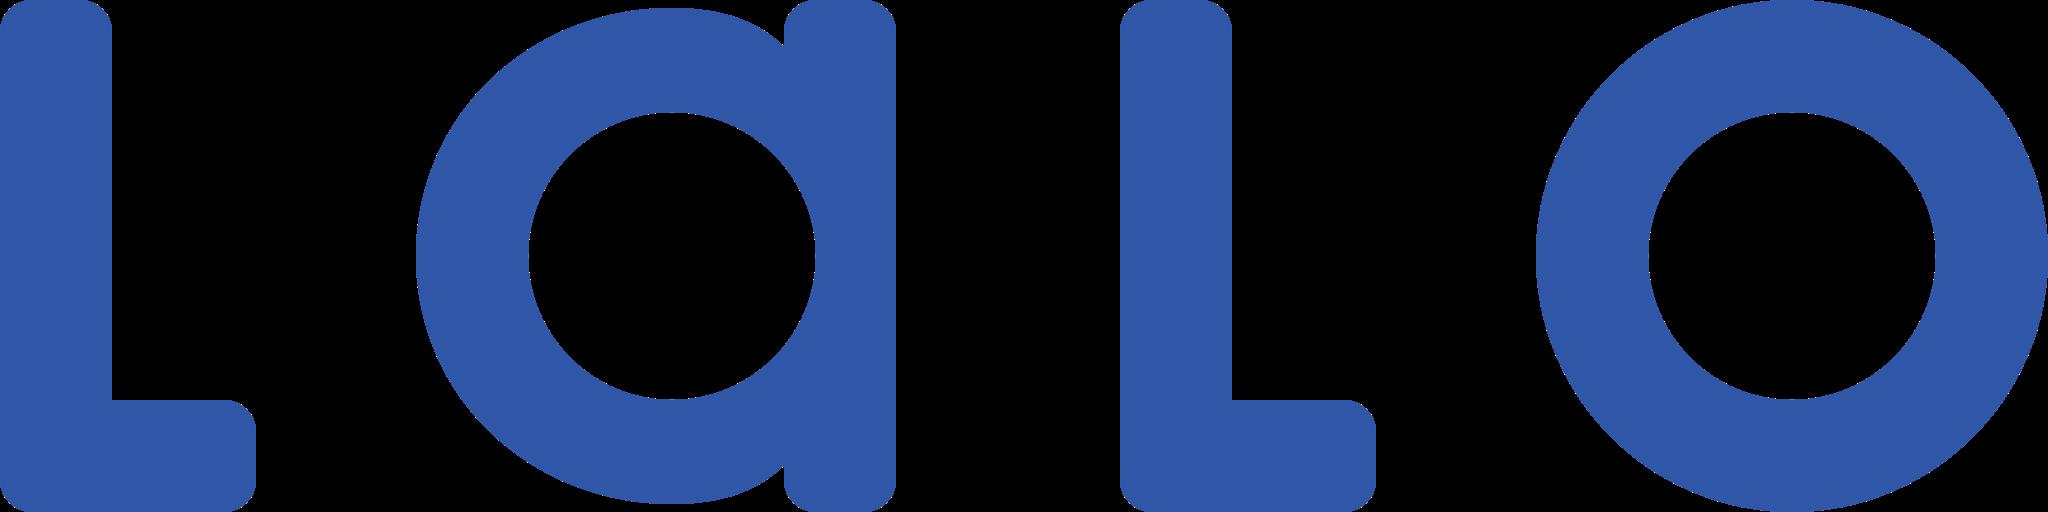 Lalo logo